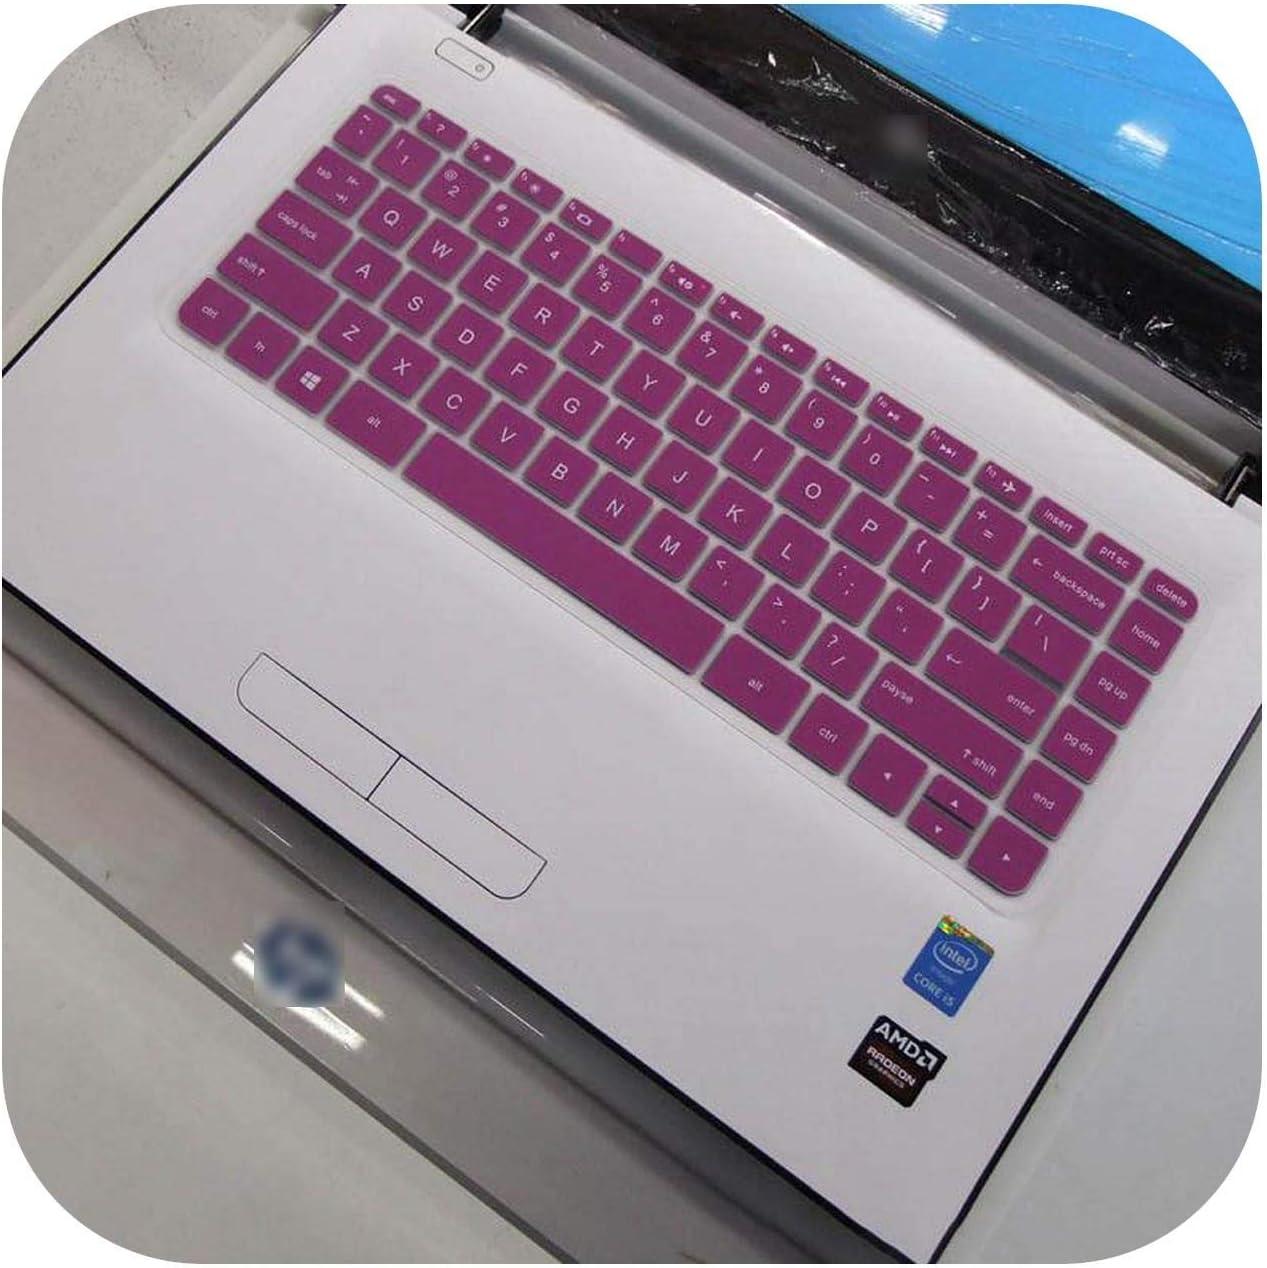 for HP Spectre x360-4113TU 4114 Pro x360 G2 M4Z17PA 13 inch Laptop Keyboard Silicone Keyboard Skin Cover-Purple-